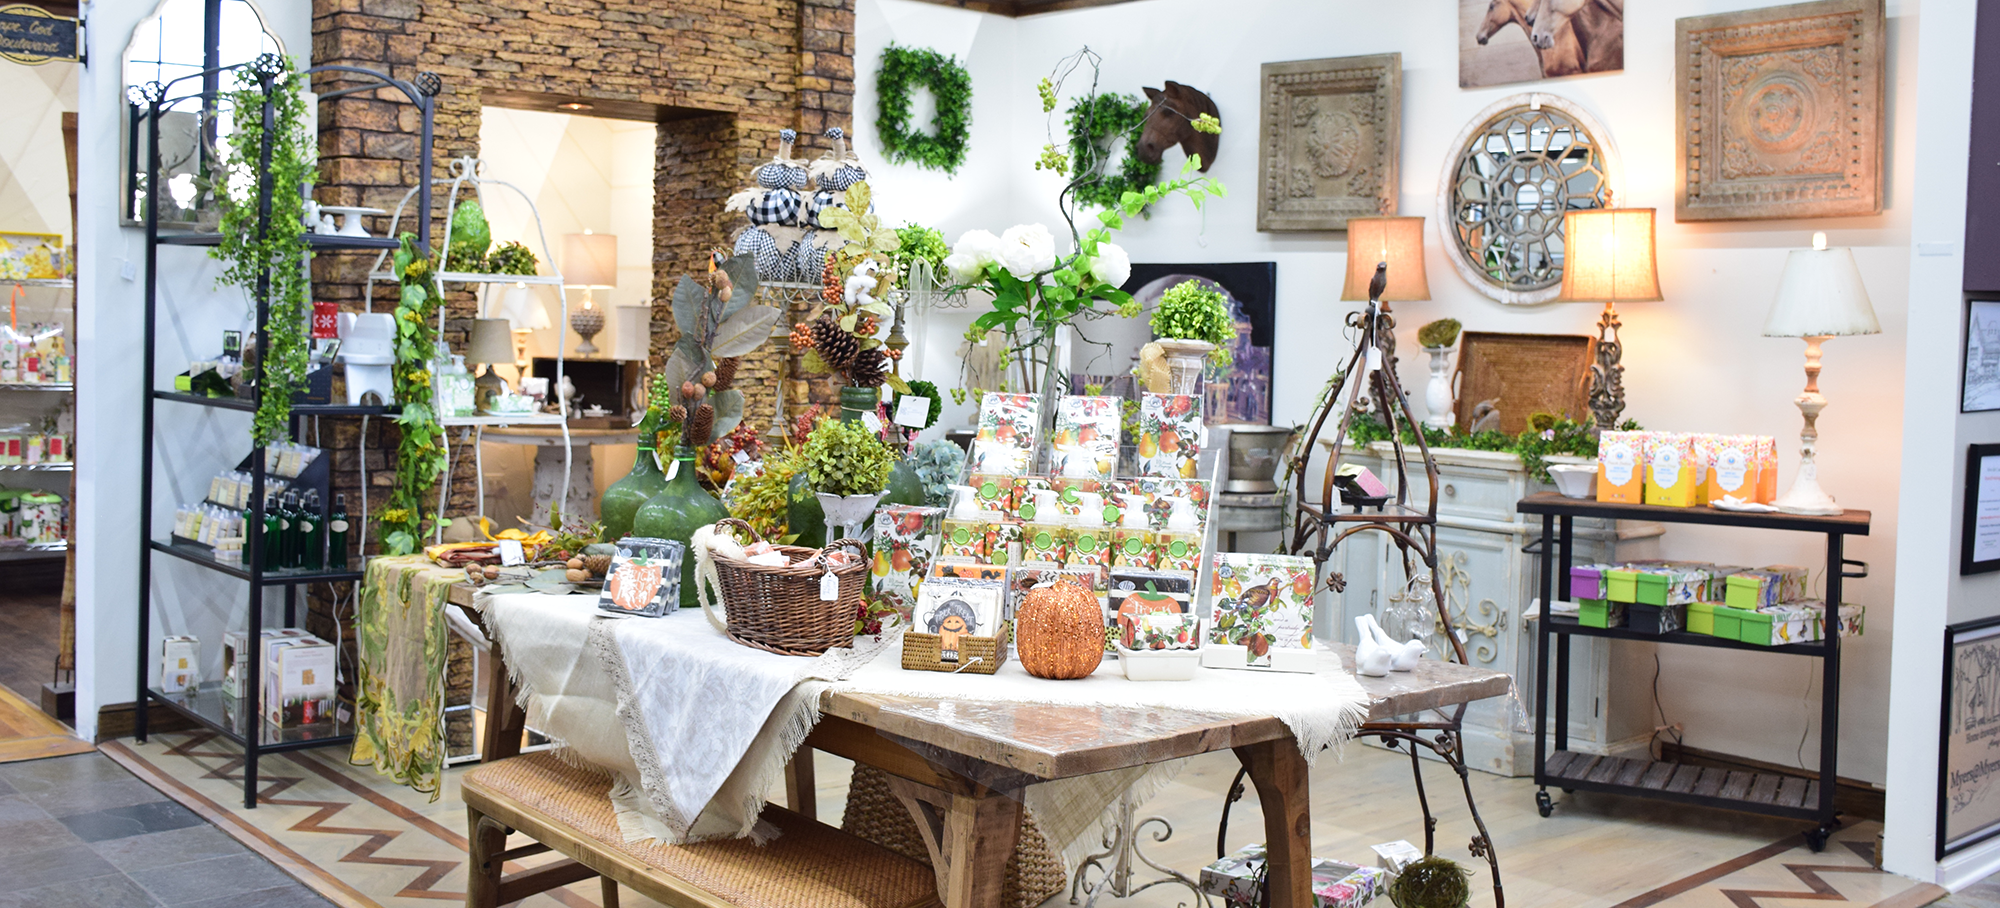 The Market at Walnut Creek   Home Decor & Gift Shop in Tulsa, OK ...